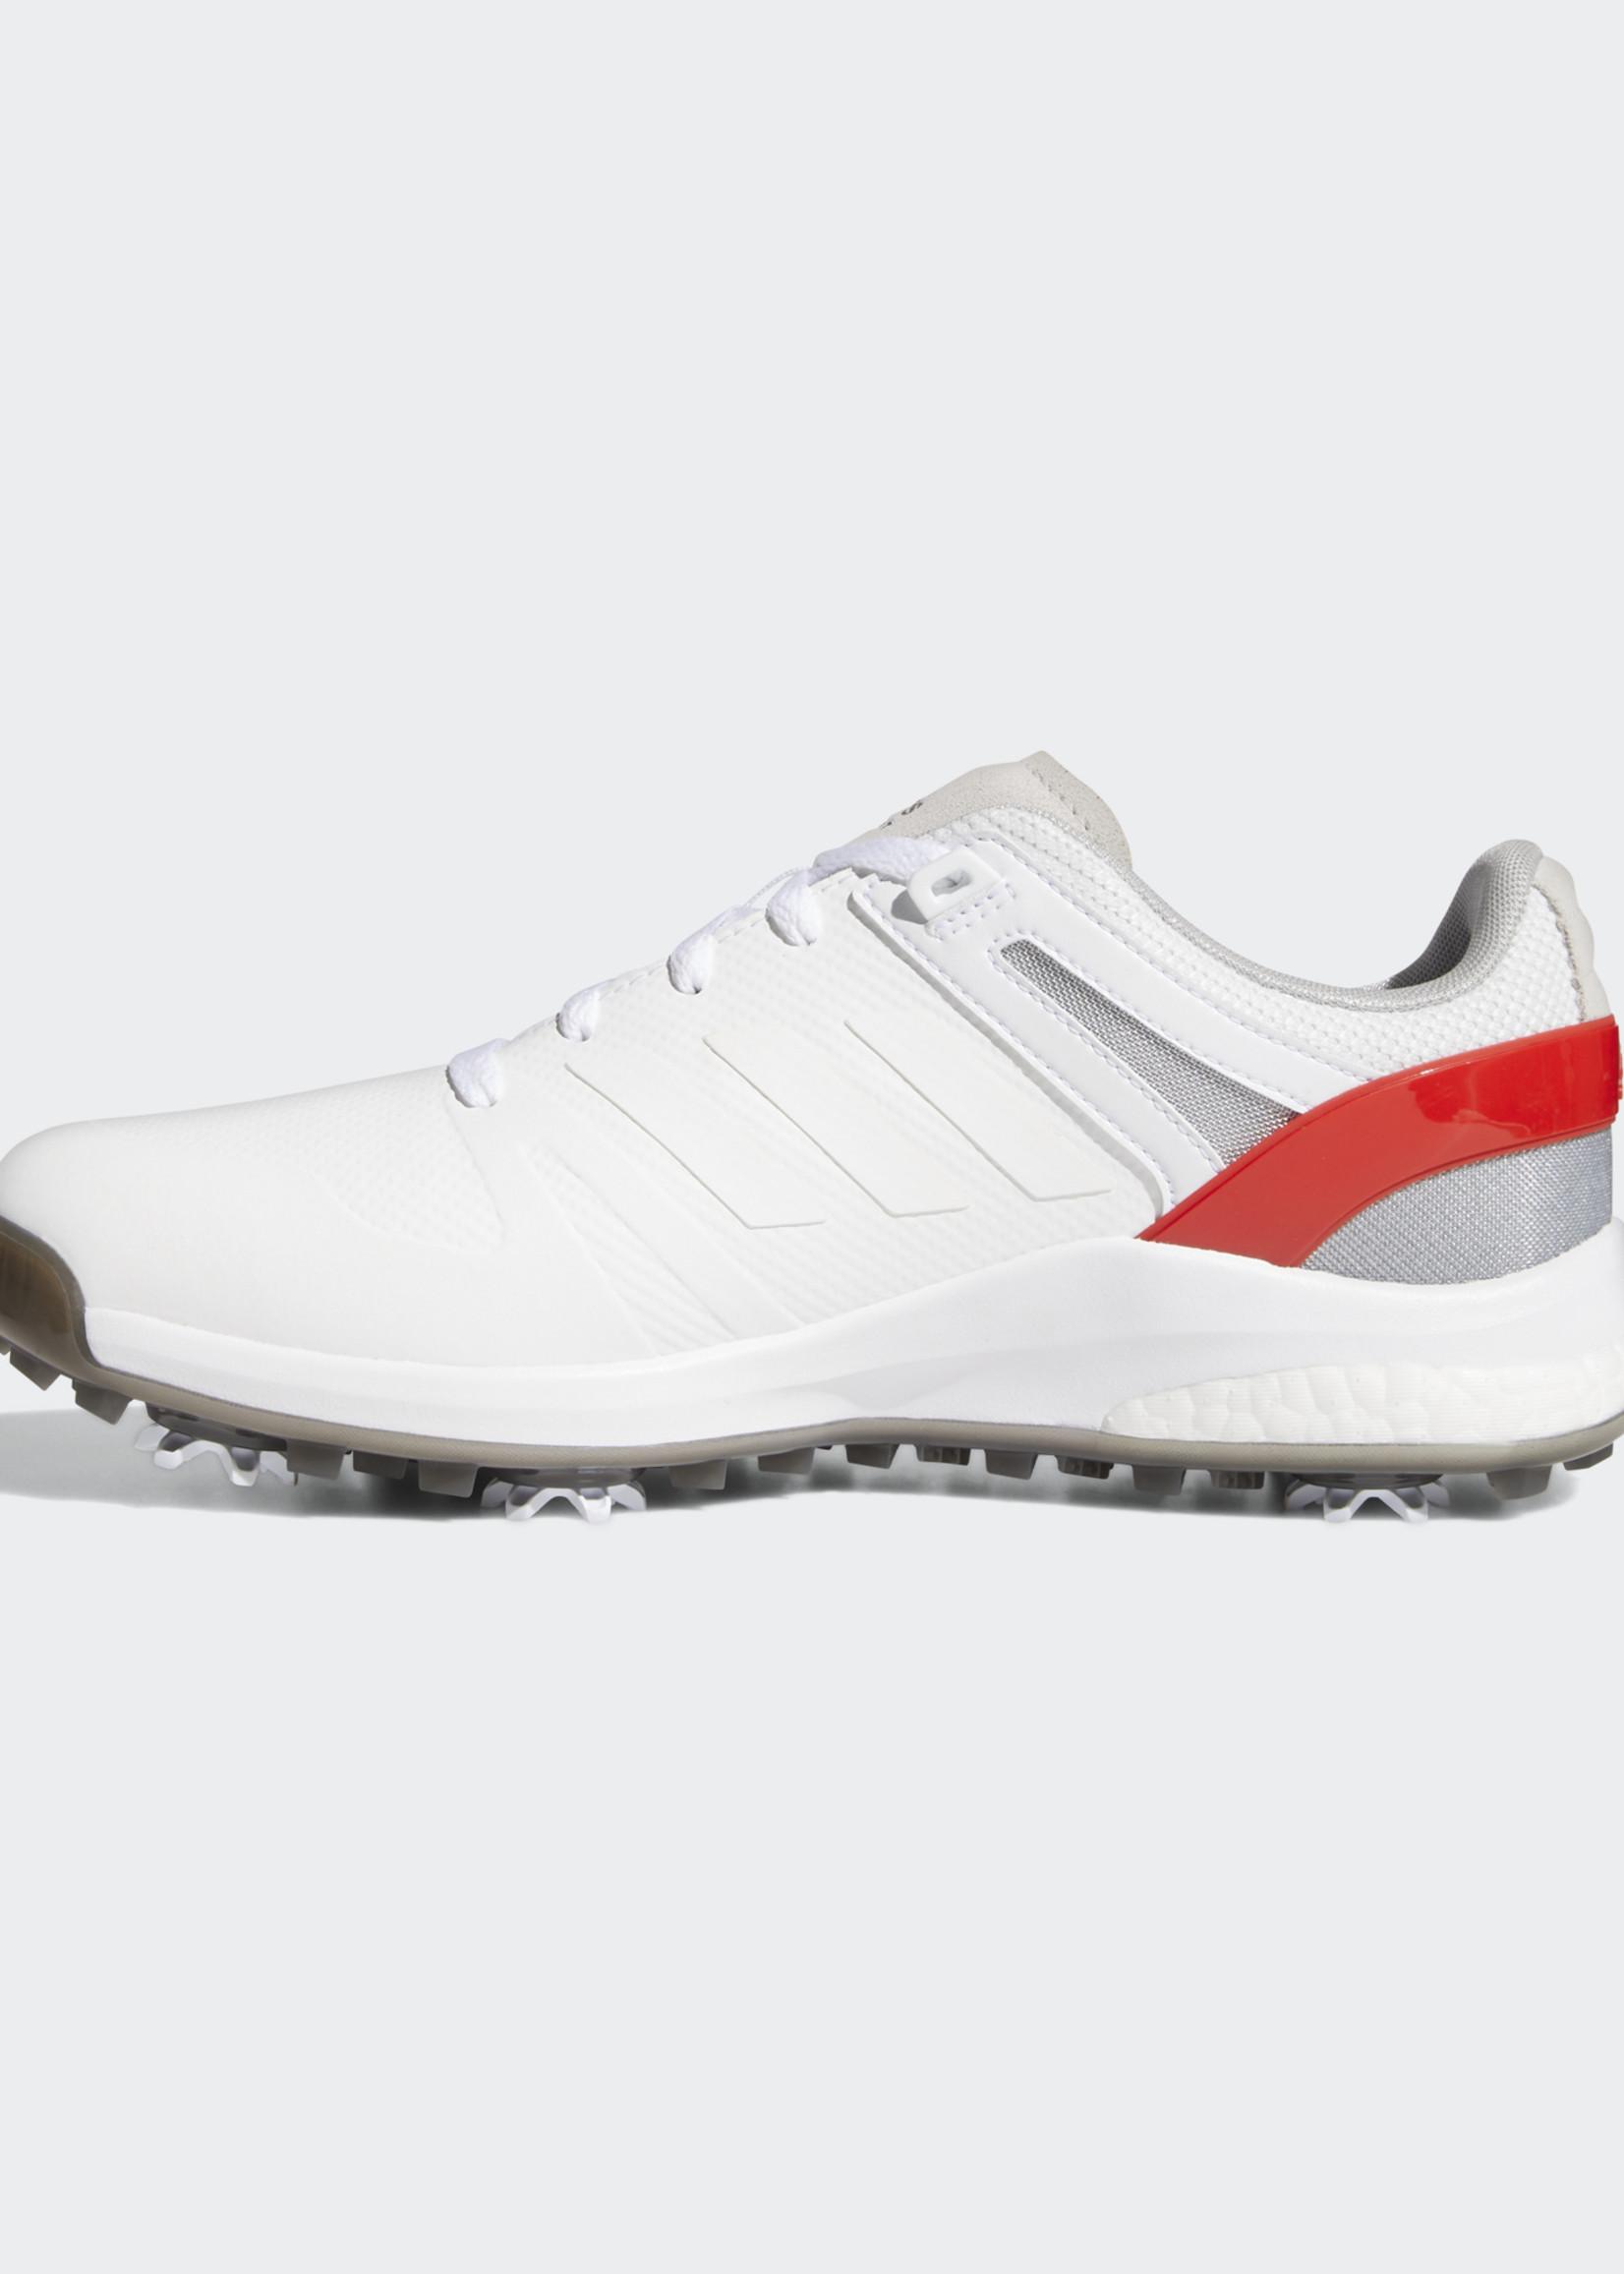 Adidas EQT                 FTWWHT/FTWWHT/VIVRED